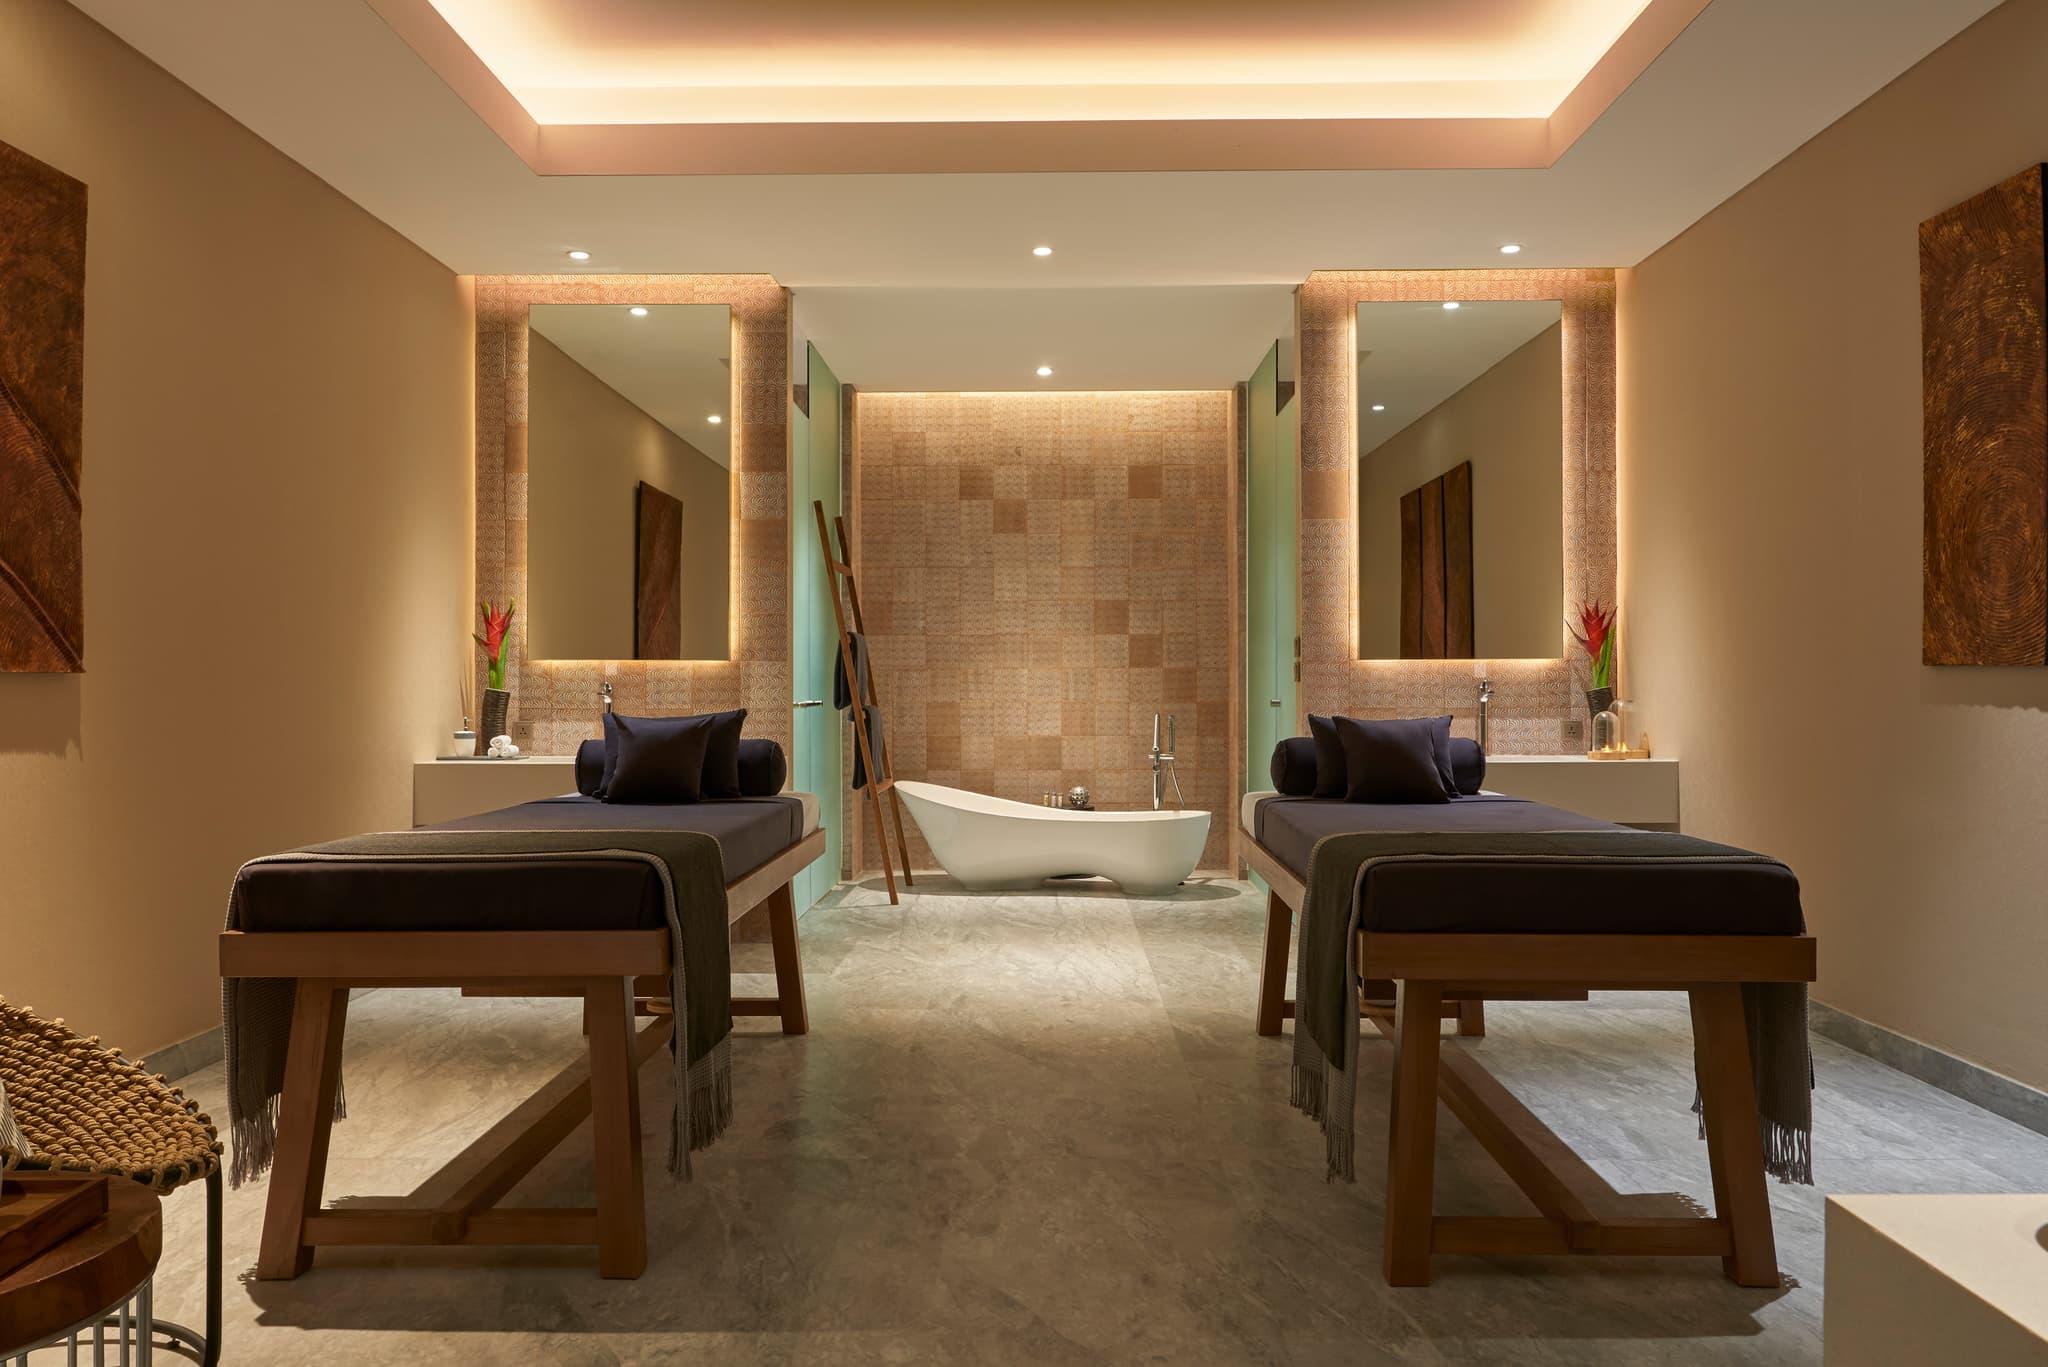 Renaissance Bali Uluwatu Resort & Spa Spa Voucher - Spa Voucher 2.5 hours treatments